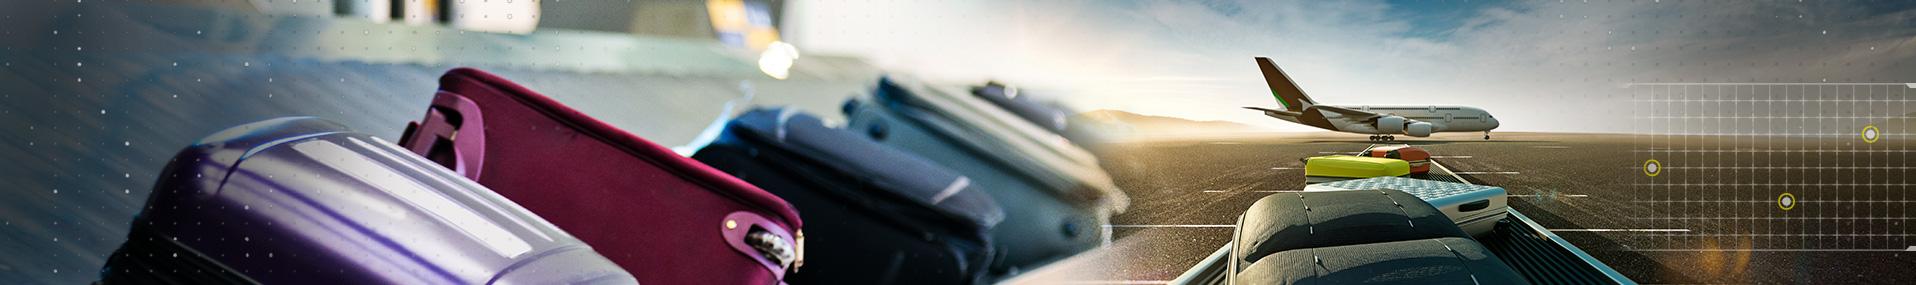 Cognex Logistics for Airport-Baggage-Handling